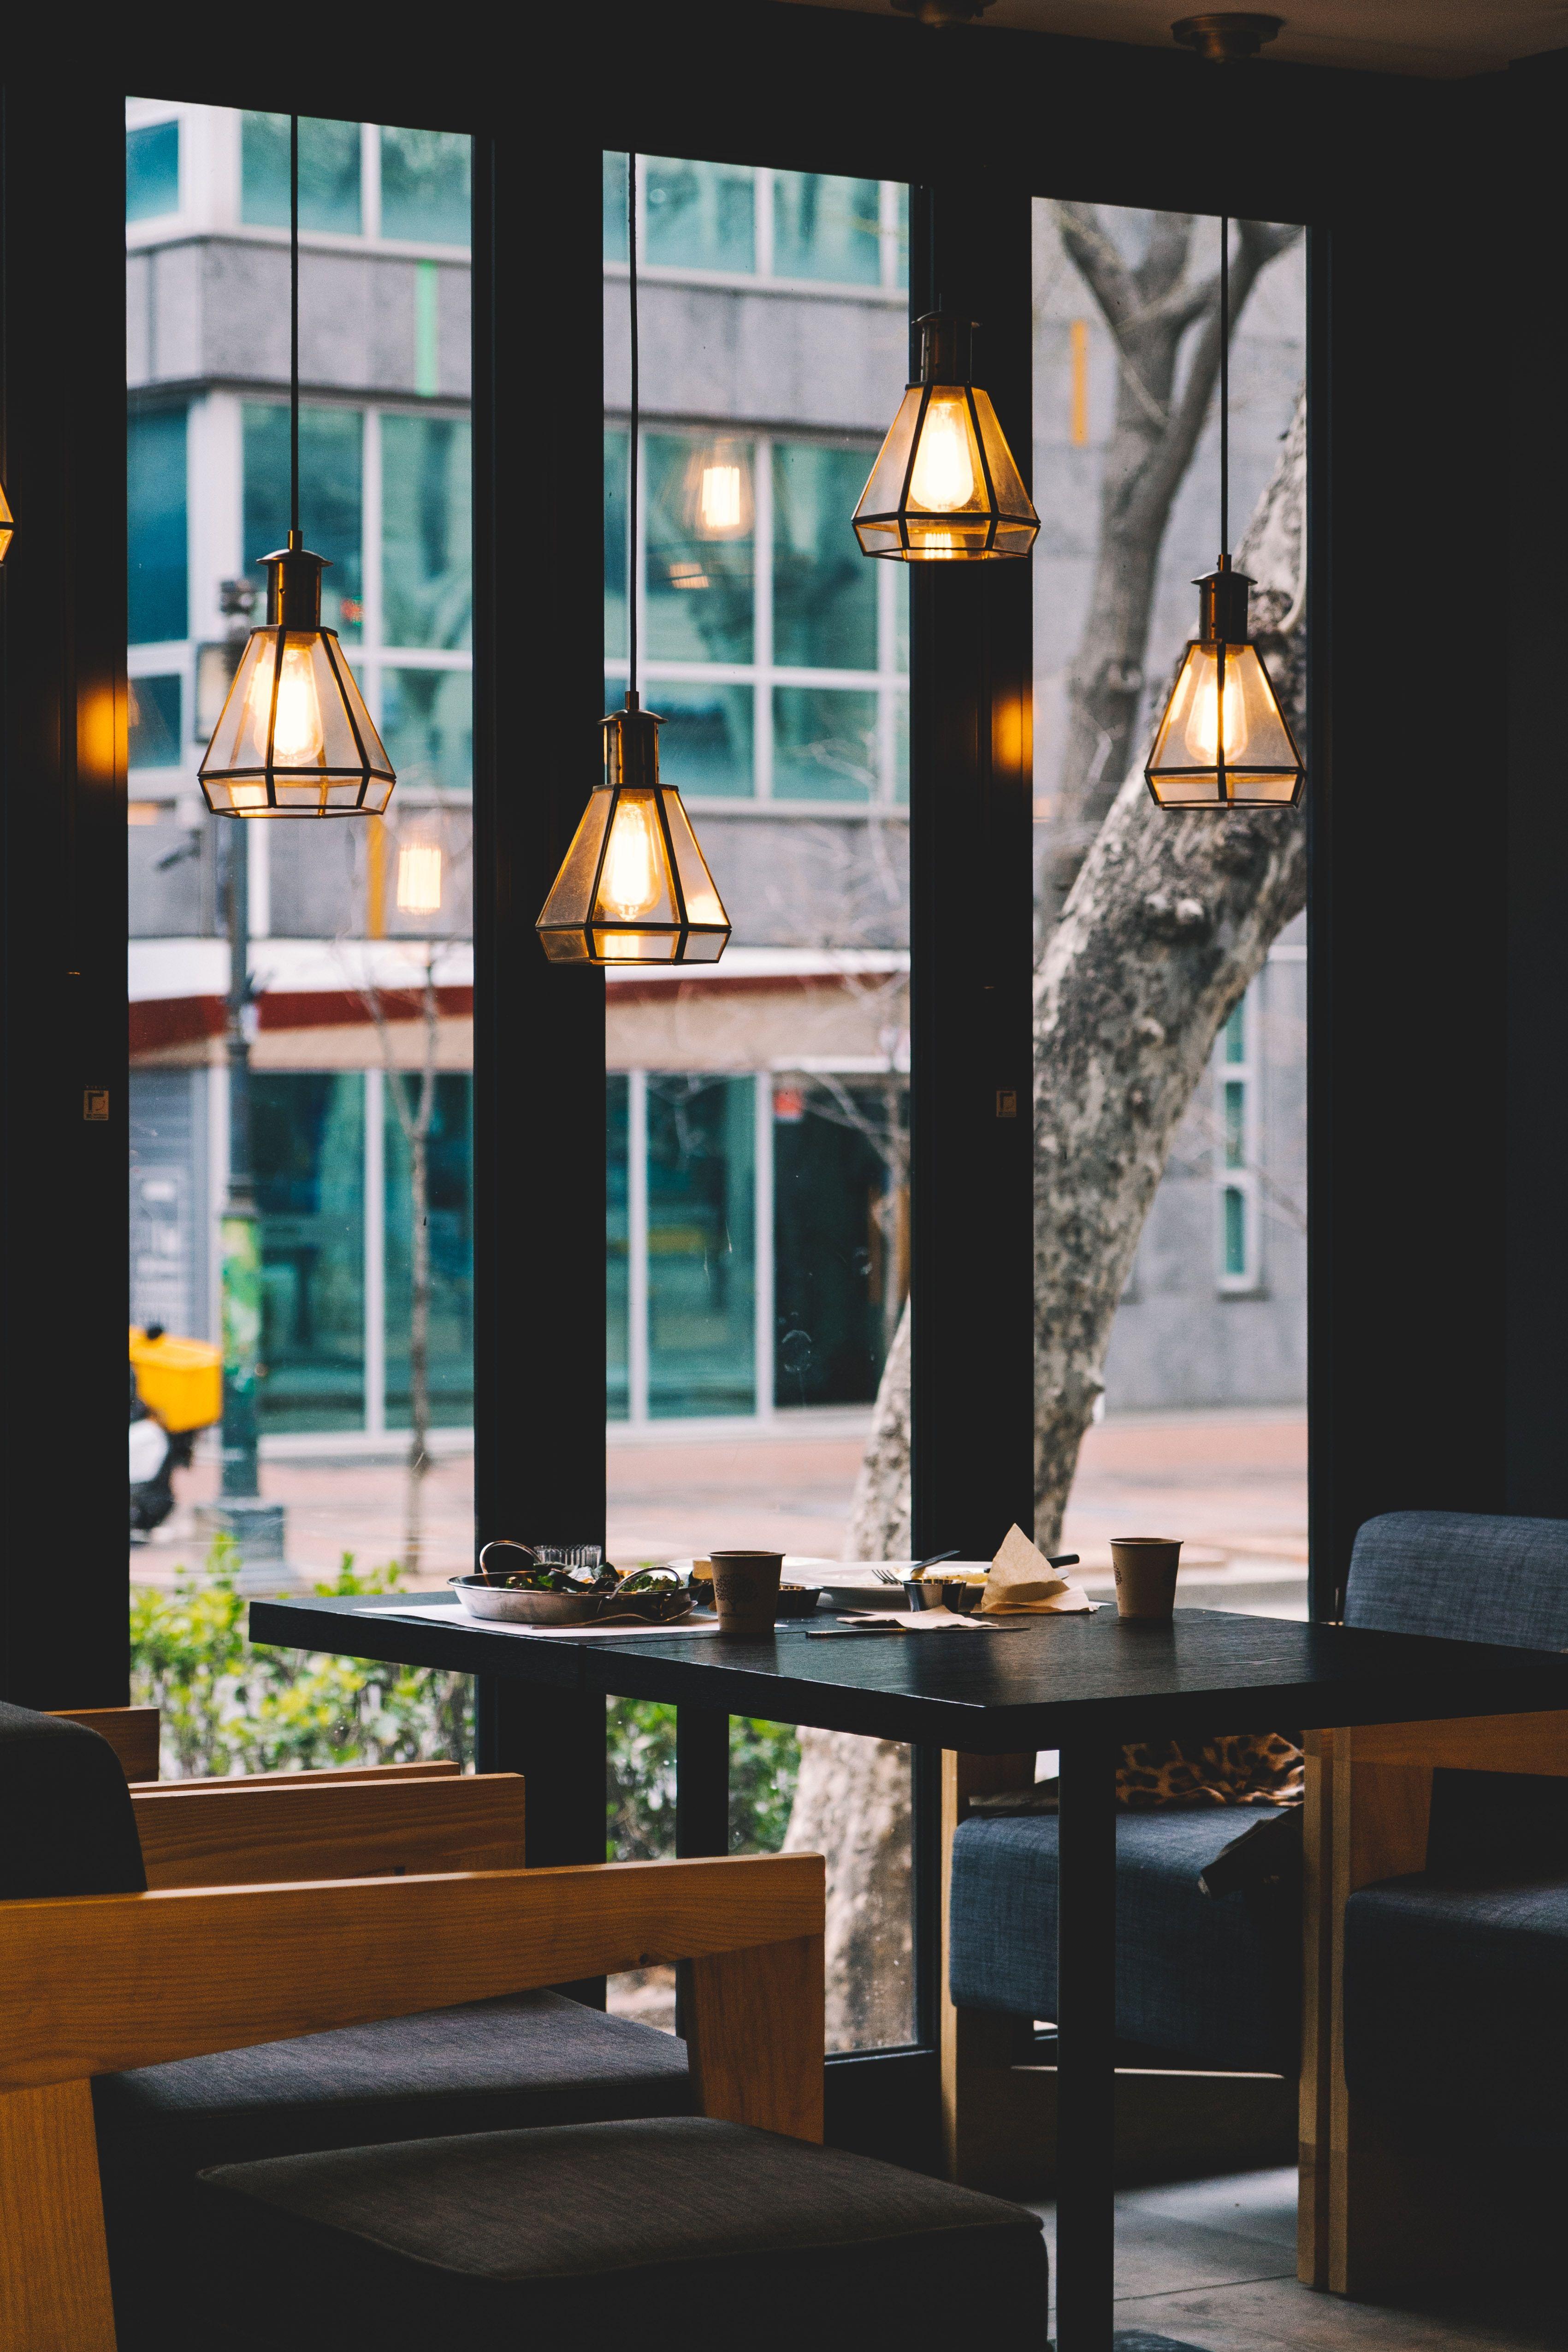 Restaurant_bundo-kim-pb9buzh1nd8-unsplash